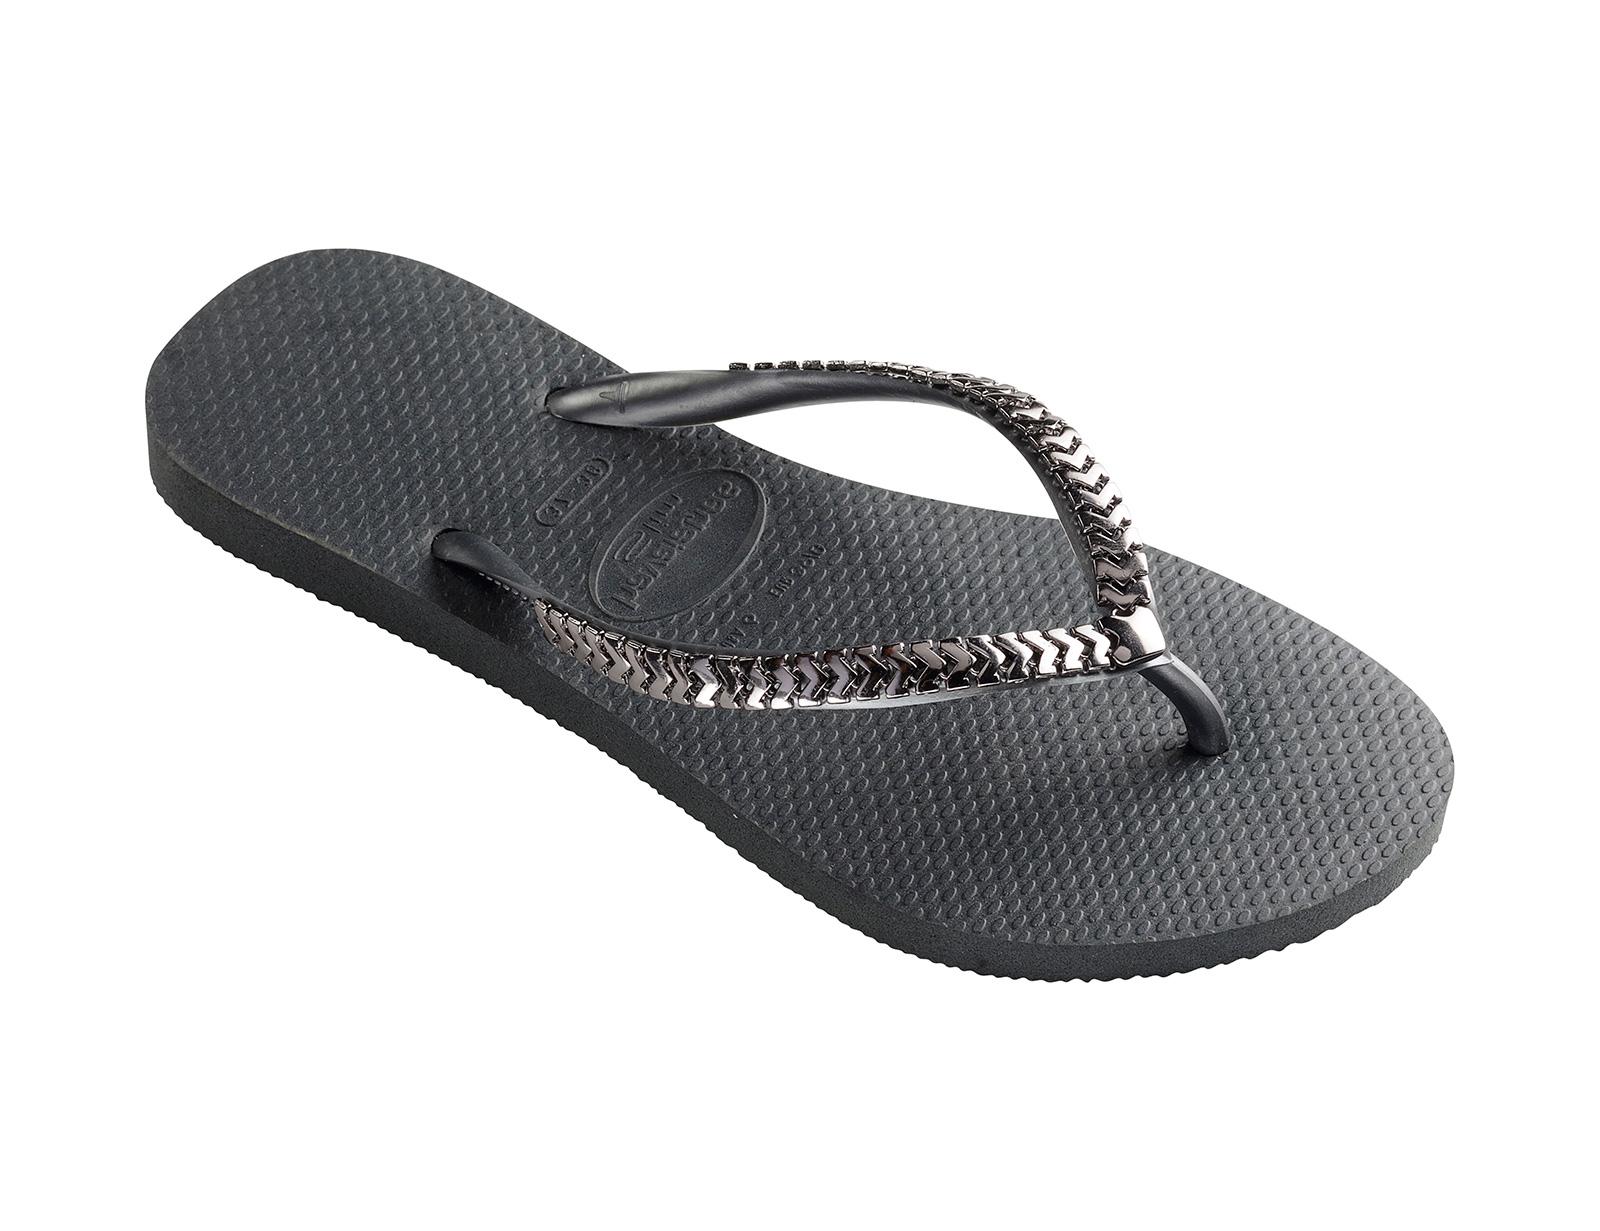 a2a9923f00a5a0 Deep Grey Flip-flops With Metallic Silver Straps - Slim Metal Grega Dark  Grey - Havaianas